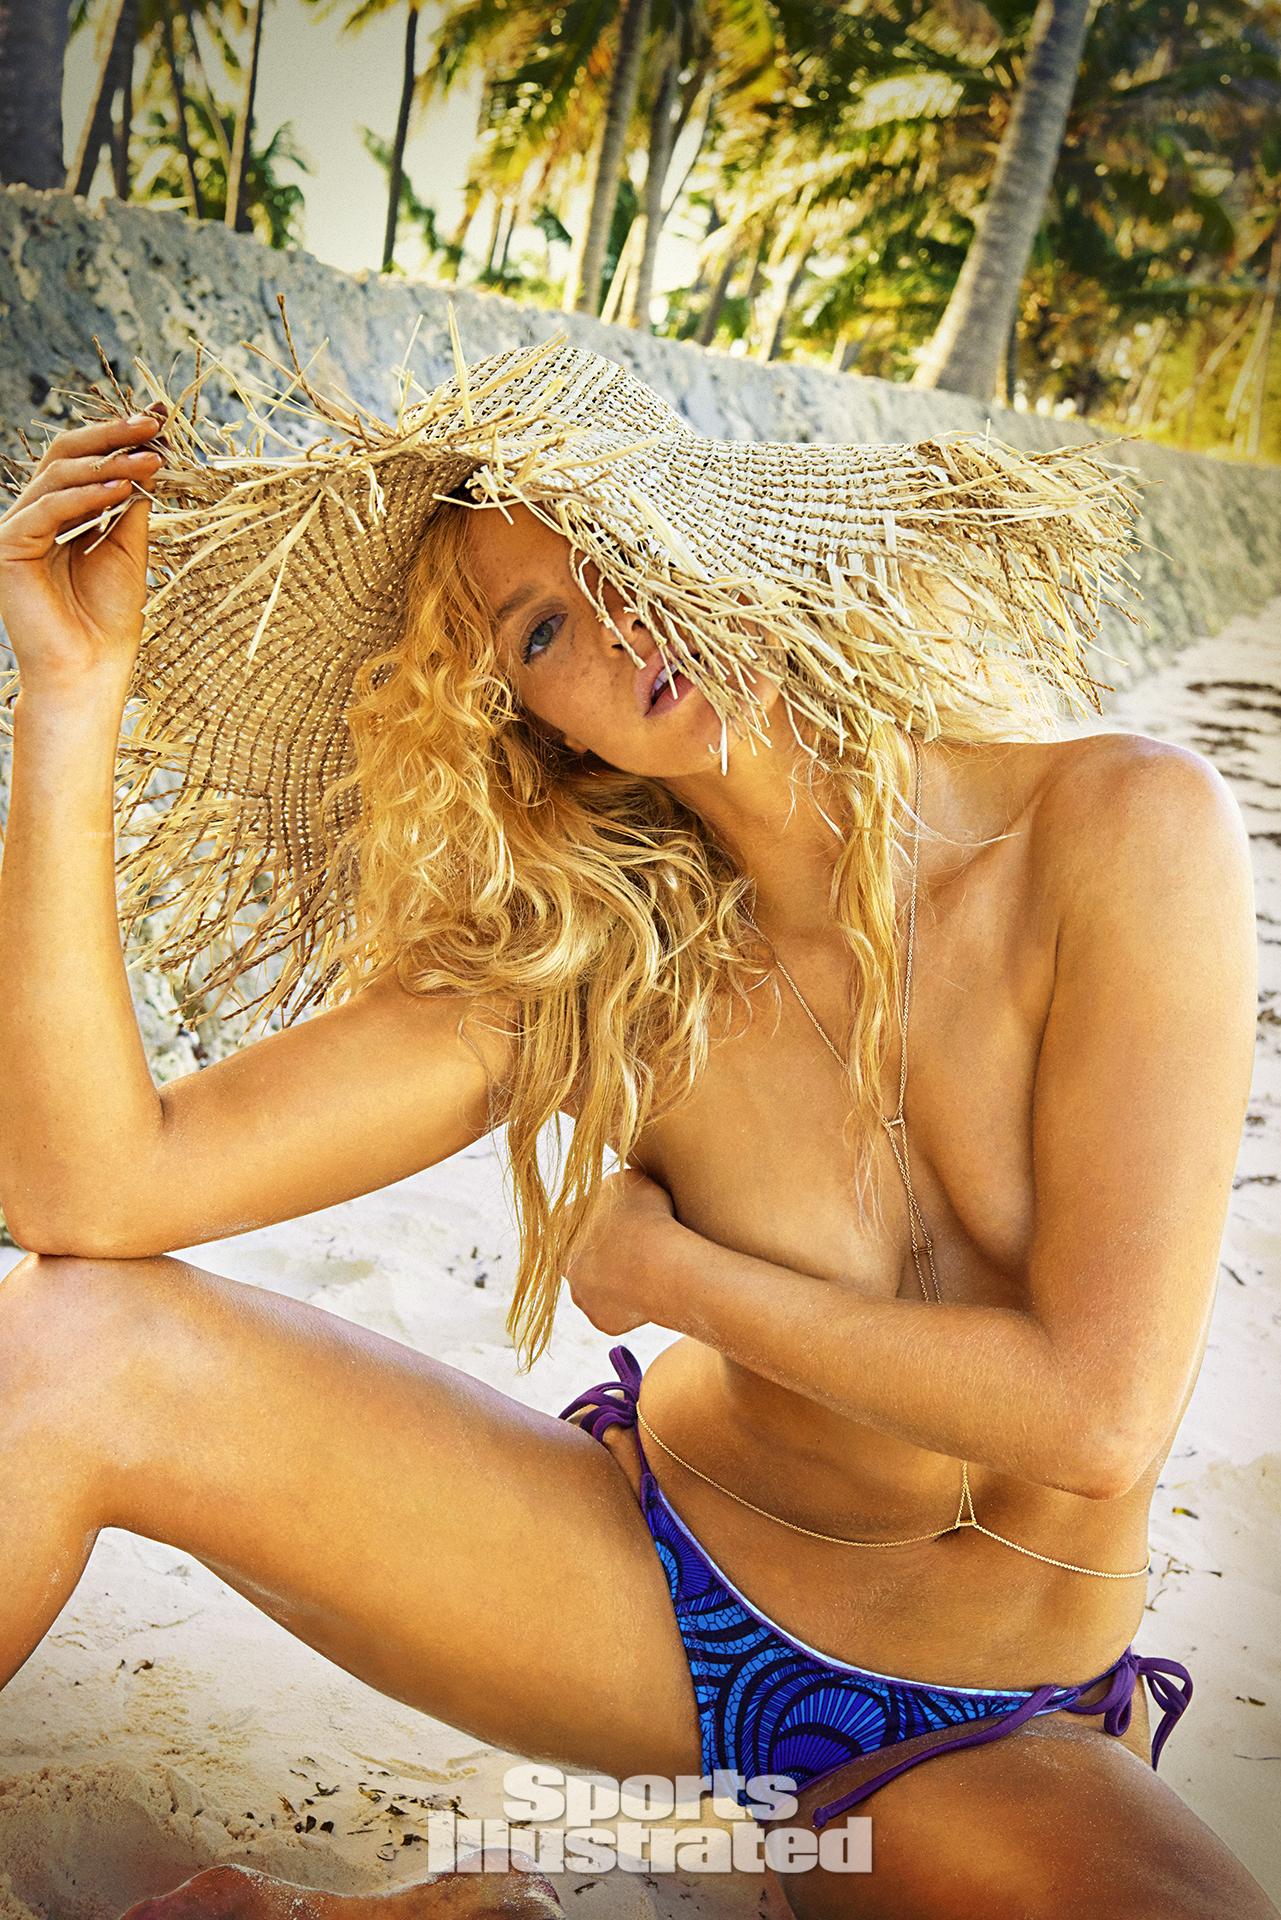 Erin Heatherton was photographed by Ruven Afanador in Zanzibar. Swimsuit by SUMMERLOVE SWIMWEAR.